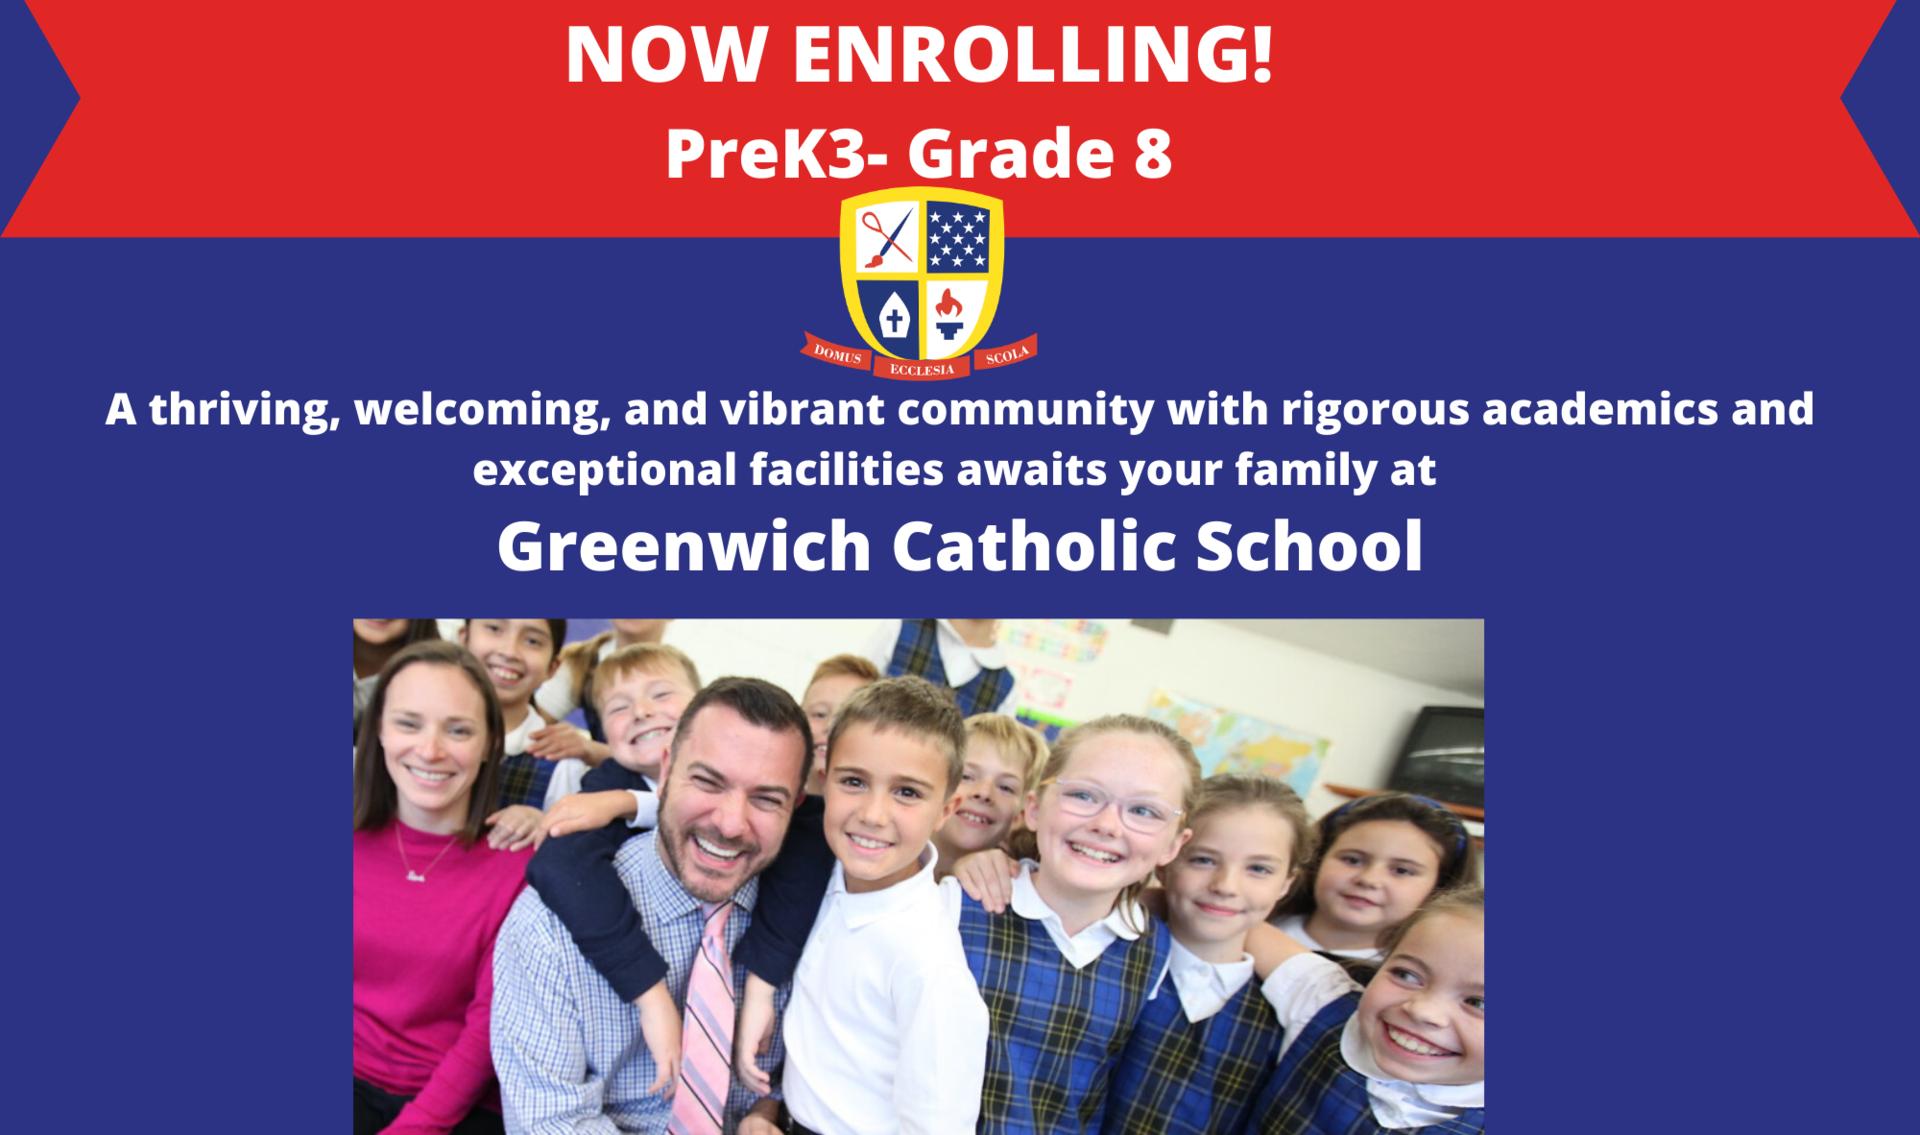 Now Enrolling PreK3- Grade 8